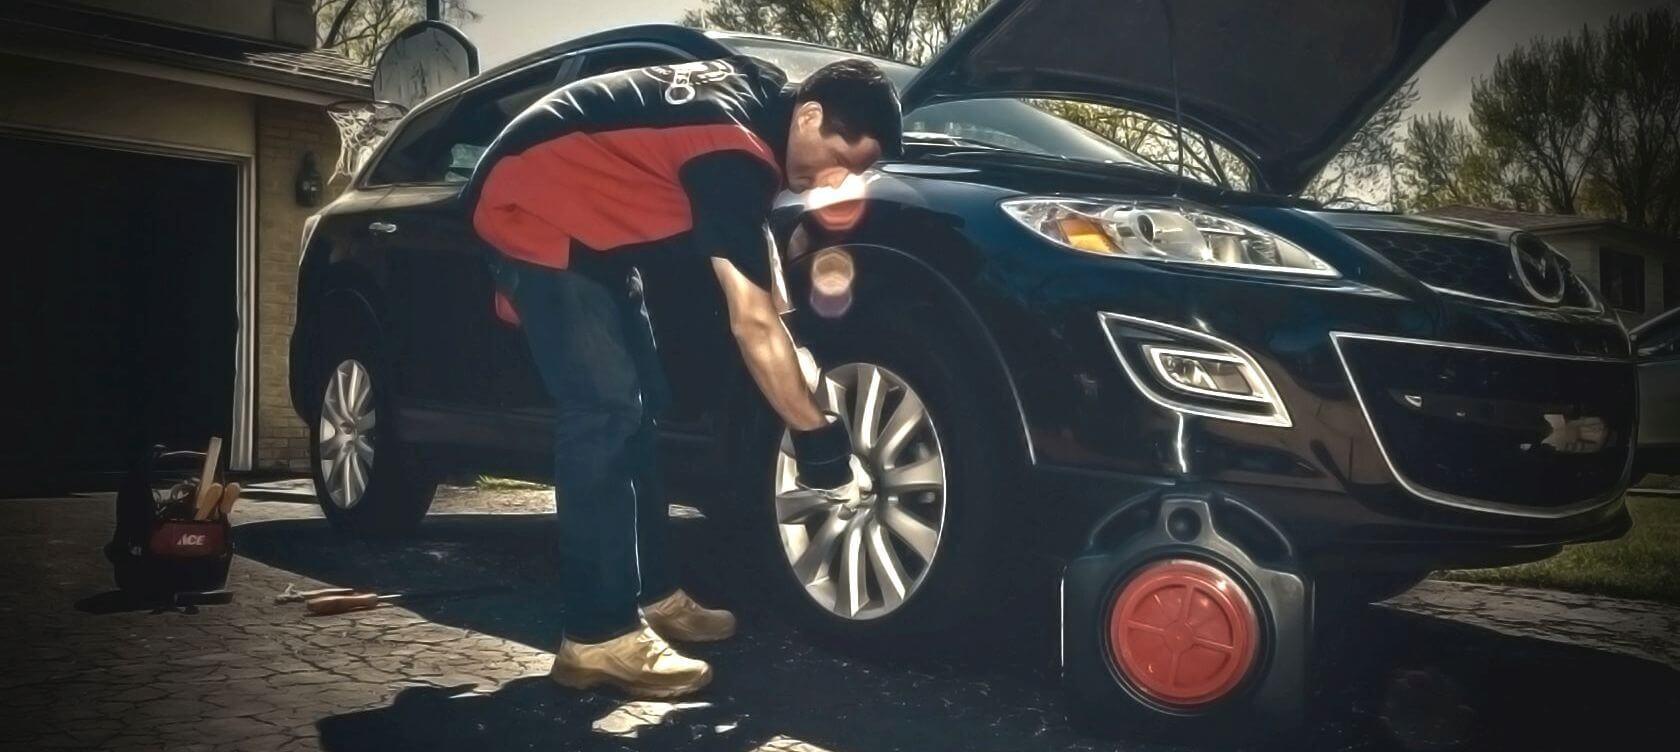 Mazda Mechanics Auto Repair At Your Location Book Online Timing Belt Cx 9